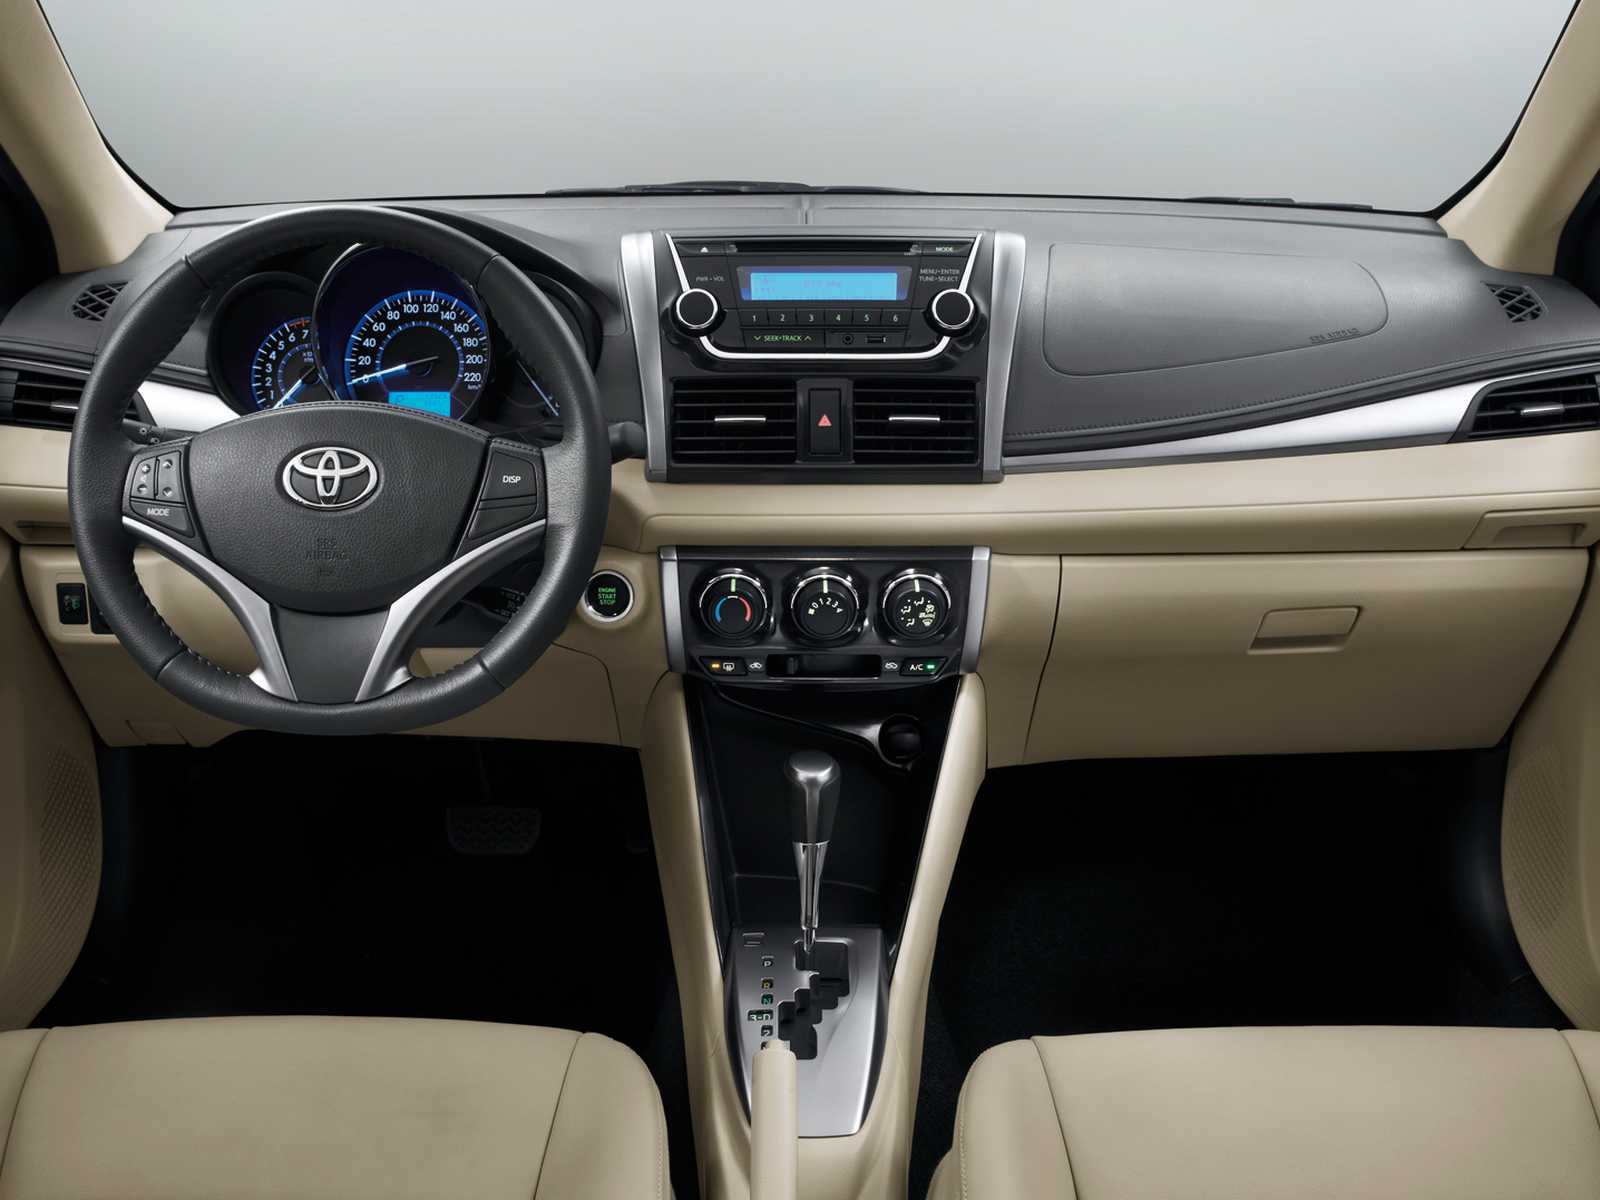 Kelebihan Kekurangan Toyota Vios 2013 Top Model Tahun Ini